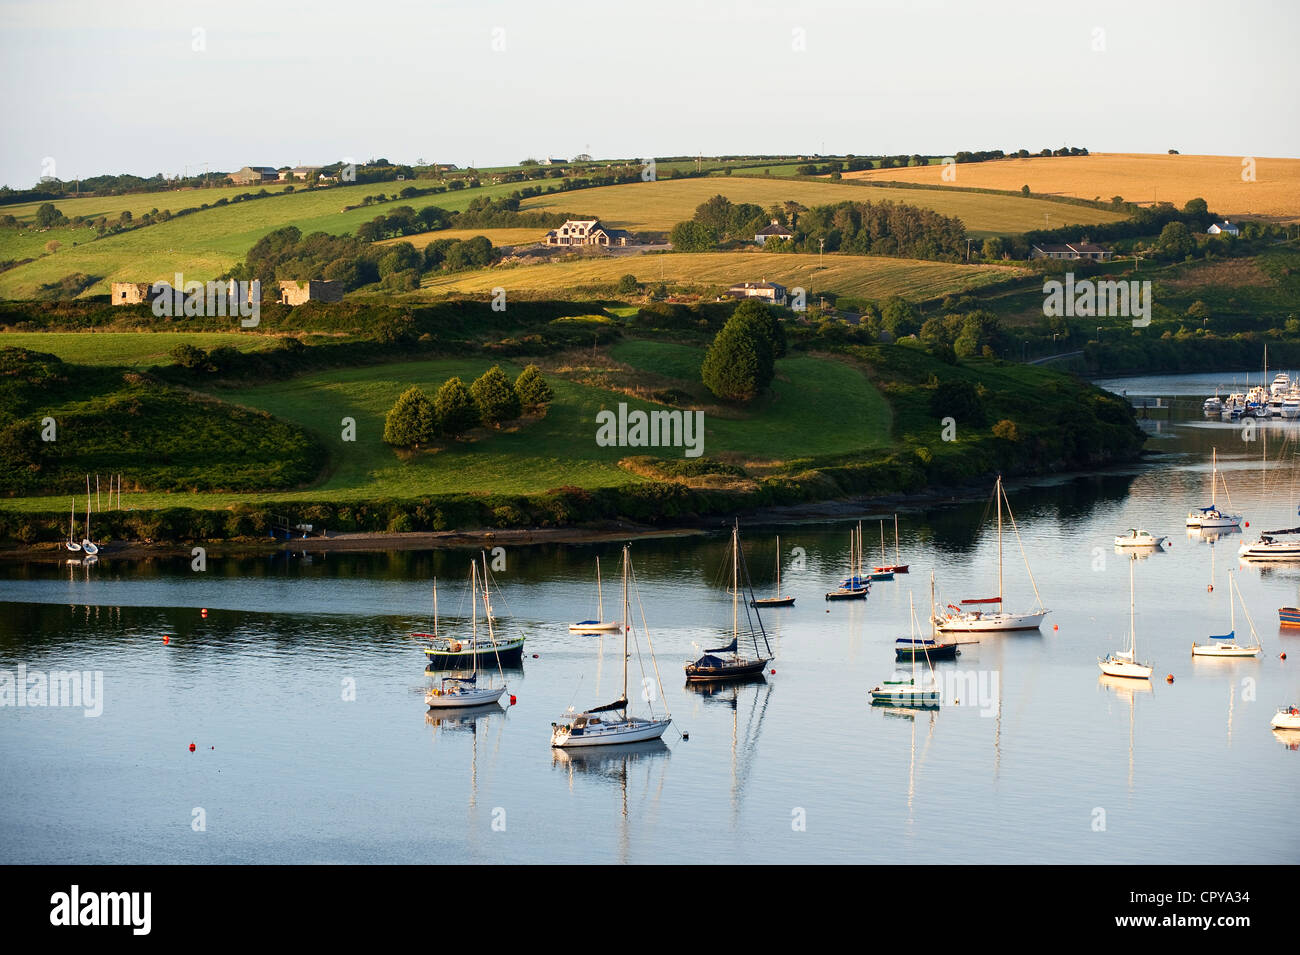 Republic of Ireland, Cork County, South West Coast, Kinsale - Stock Image